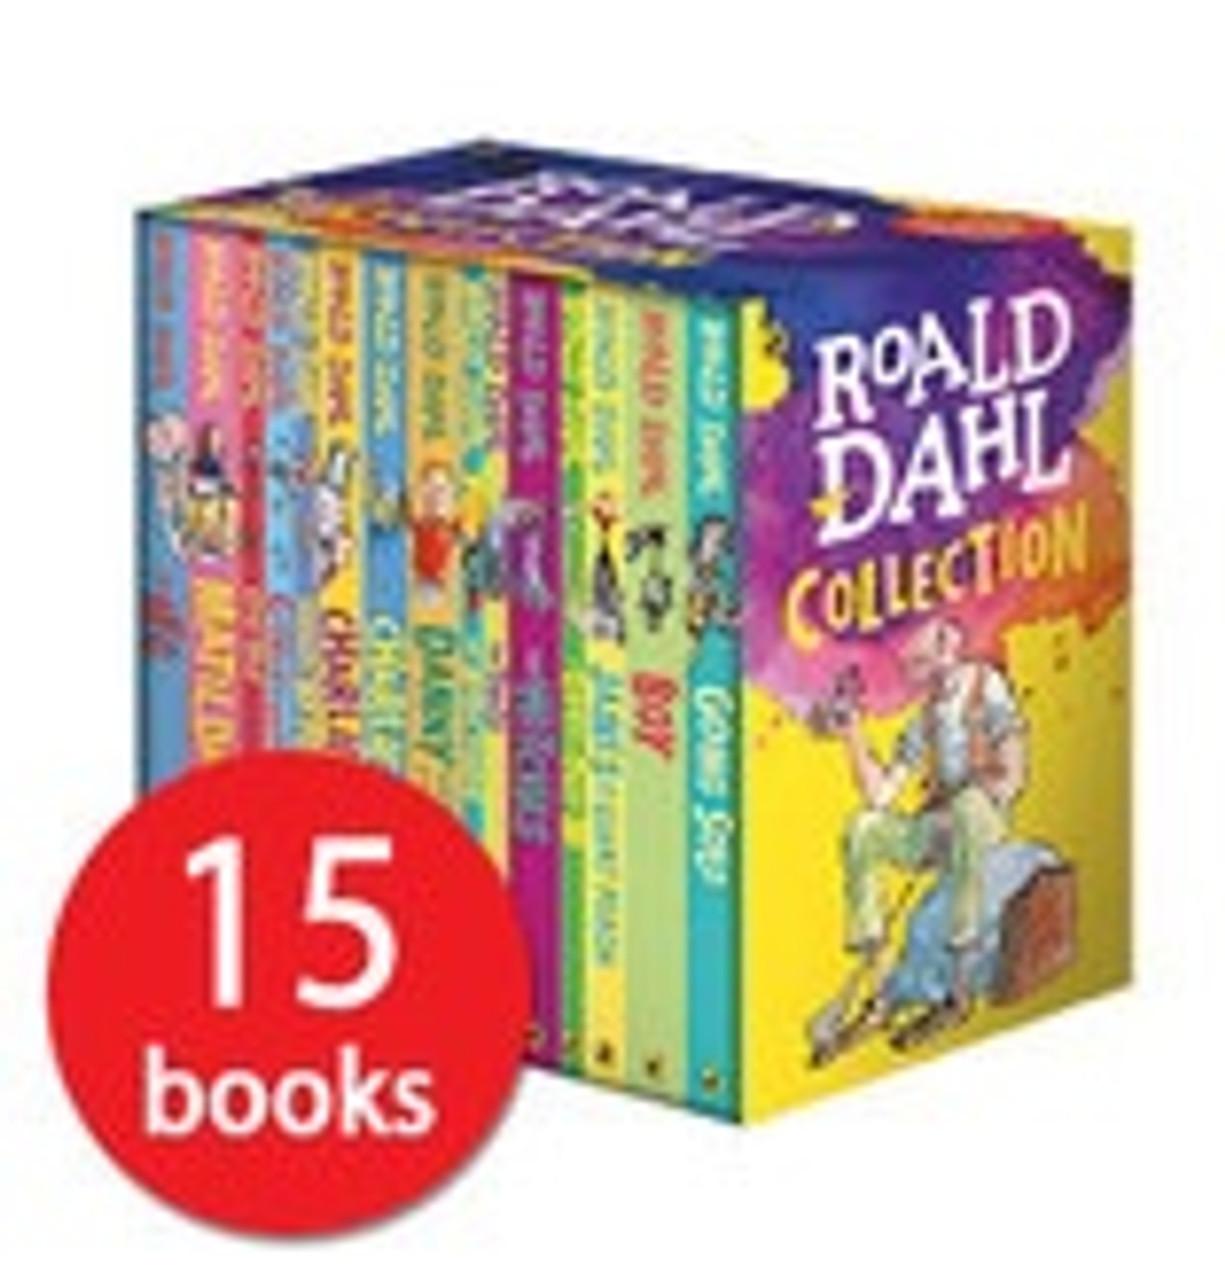 ROALD DAHL COLLECTION 15 STORIES